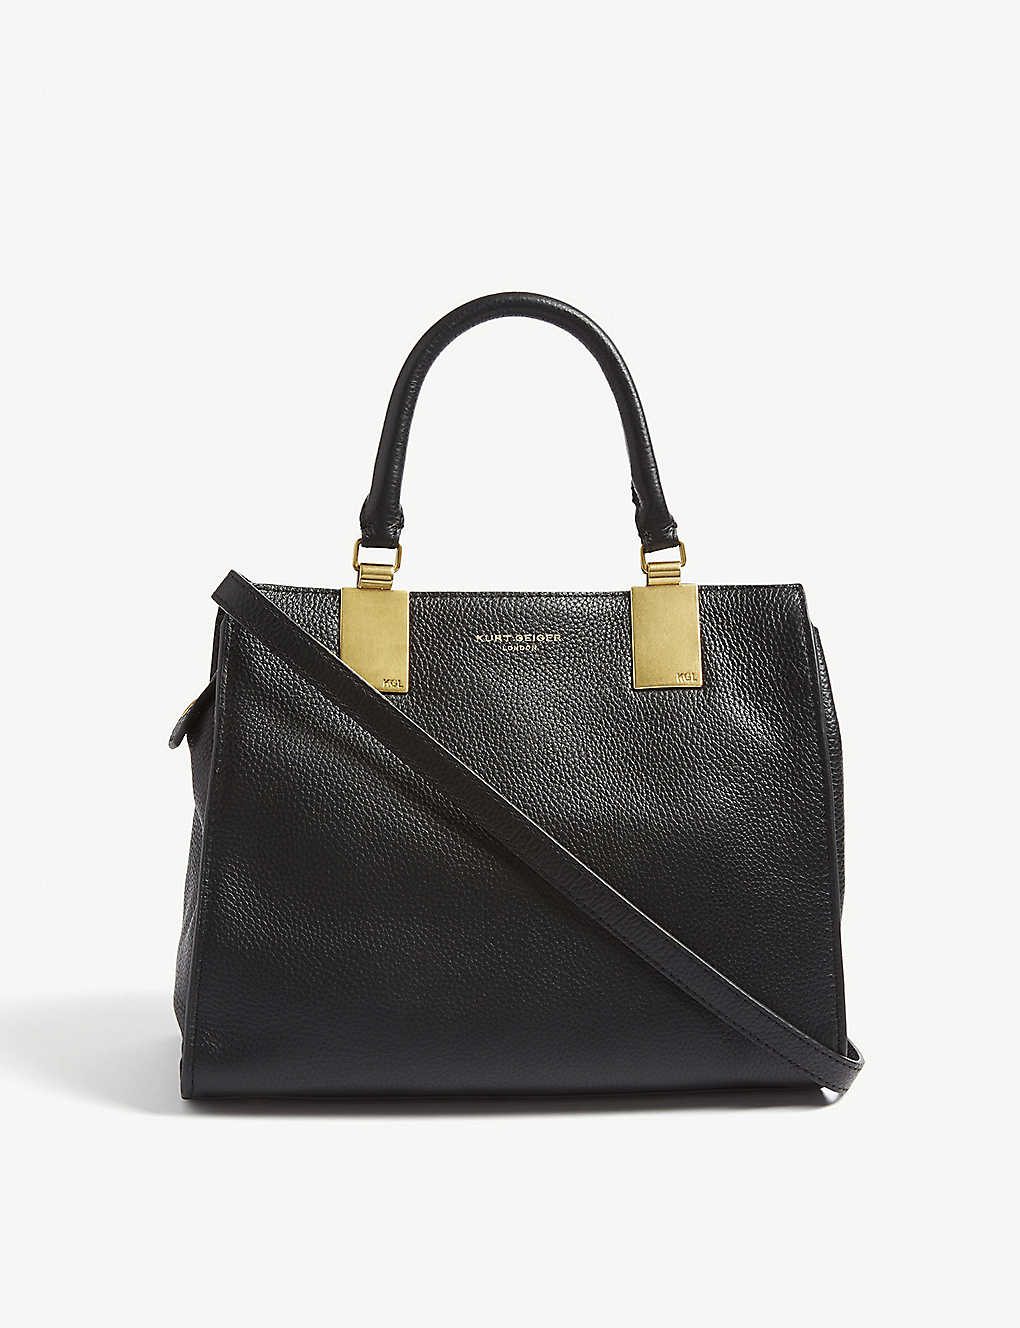 ab19a393abf0 KURT GEIGER LONDON - Emma small leather tote